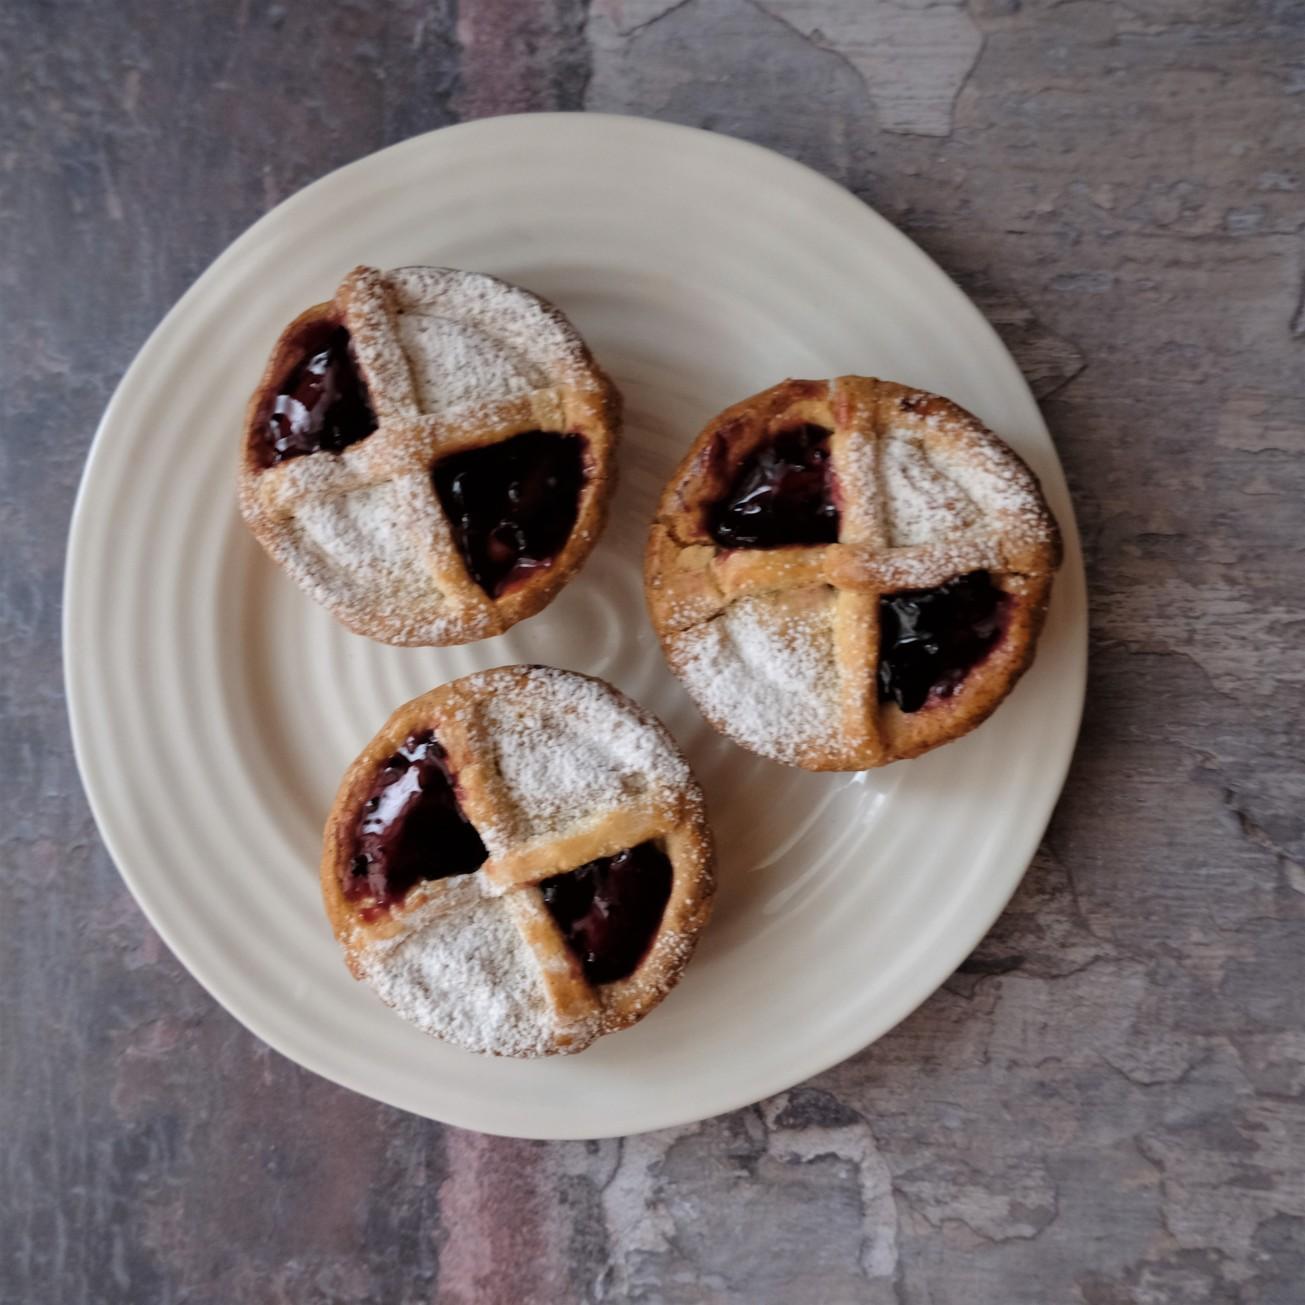 Pont-neuf pastries